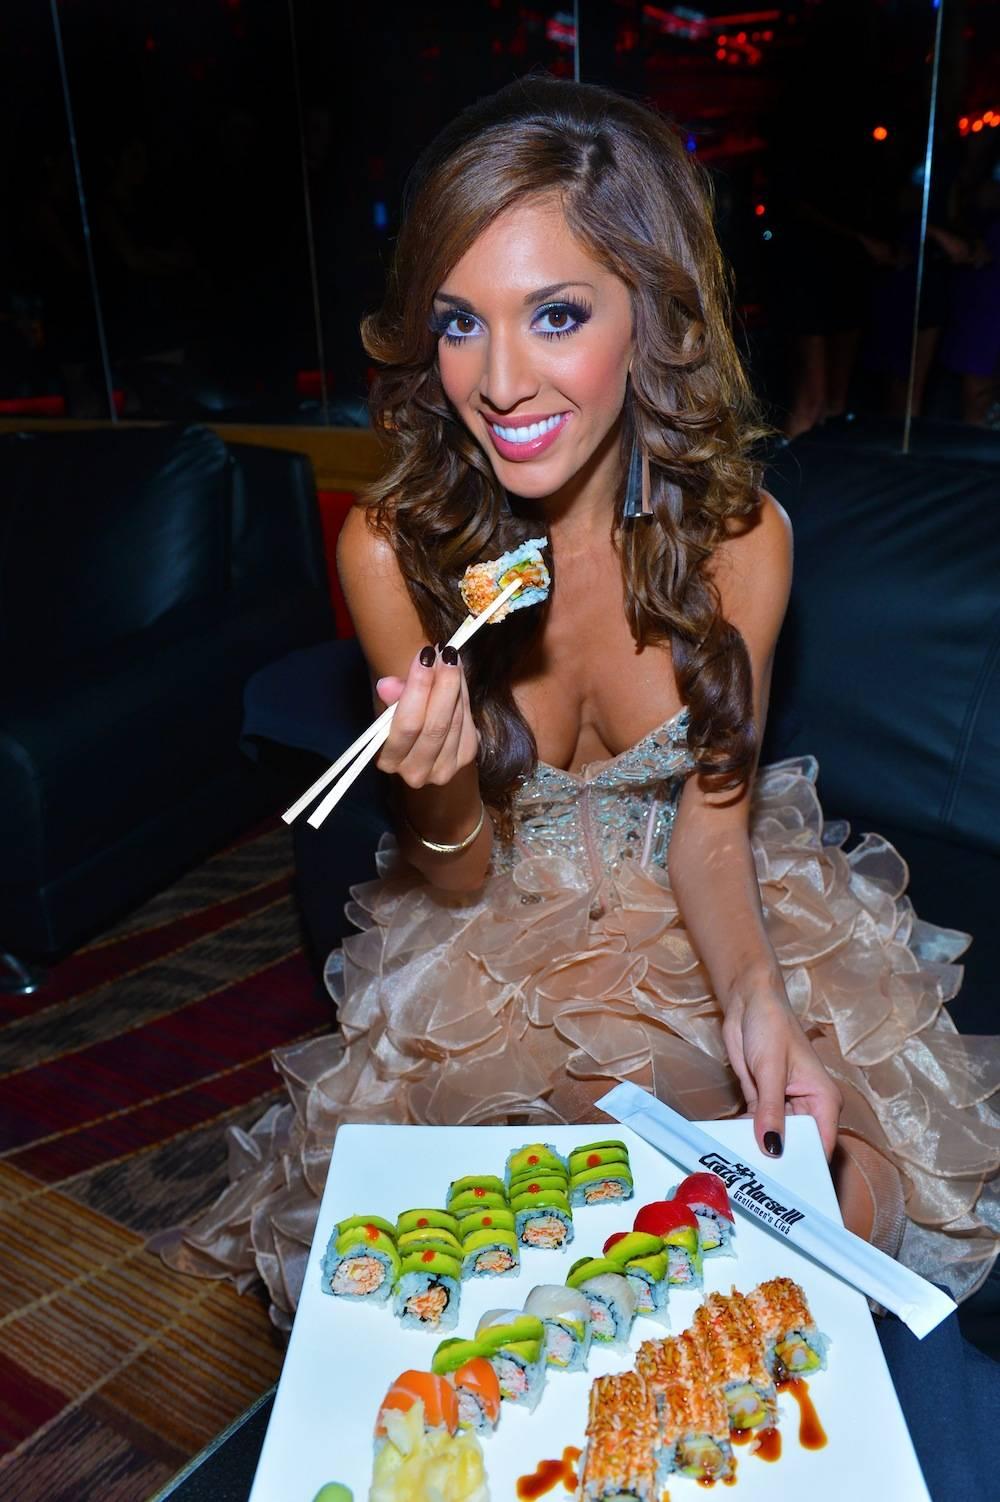 Farrah Abraham enjoying sushi at Crazy Horse III